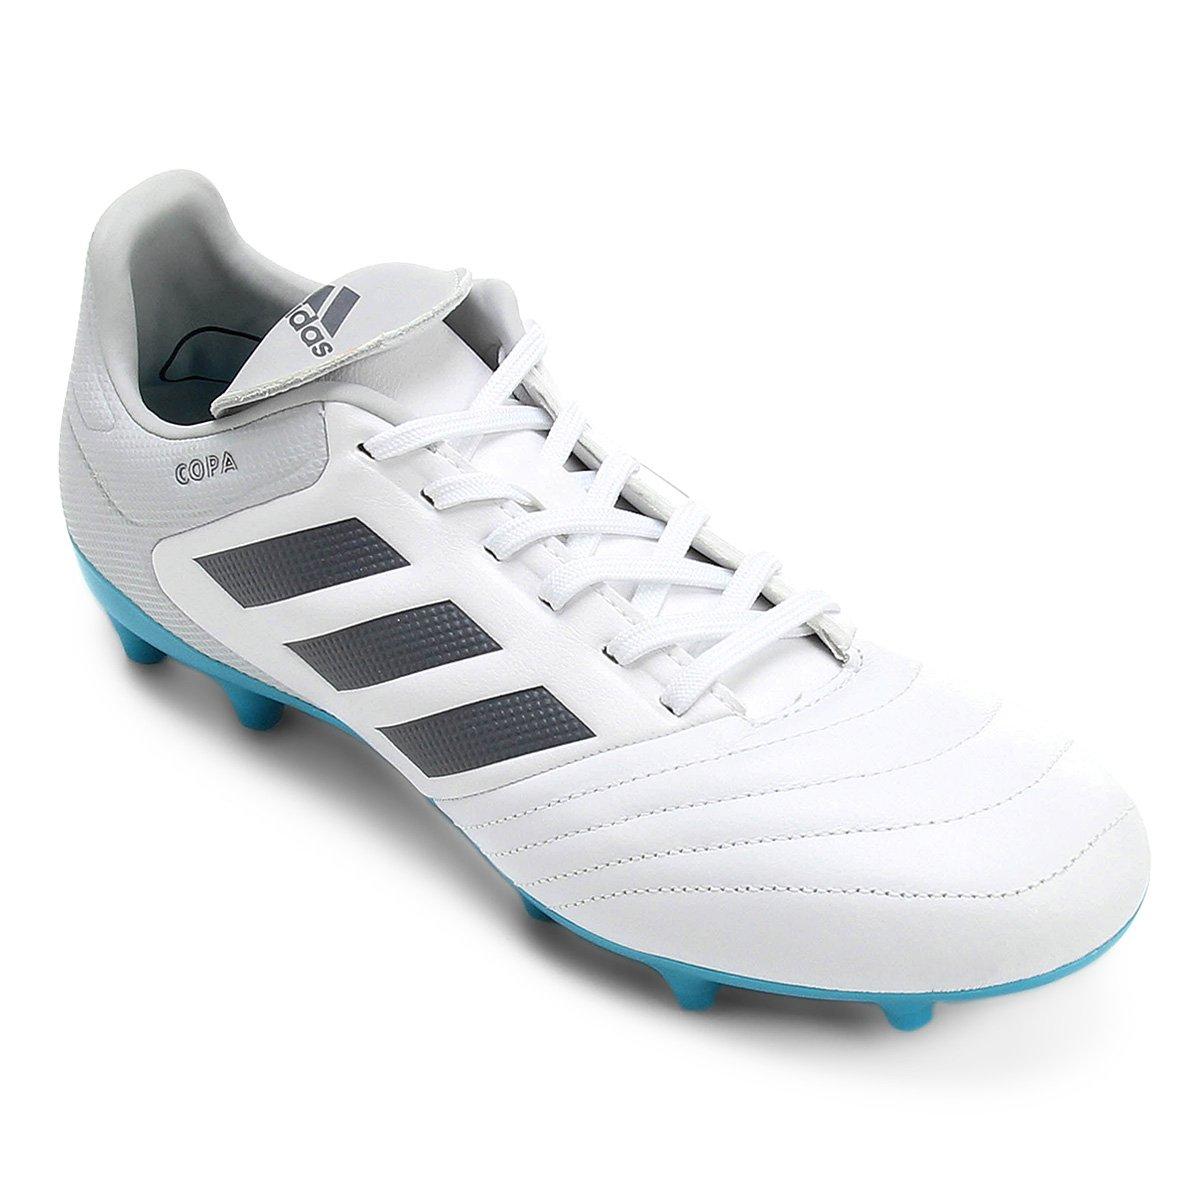 86a5e297f3 Chuteira Campo Adidas Copa 17.3 FG - Branco